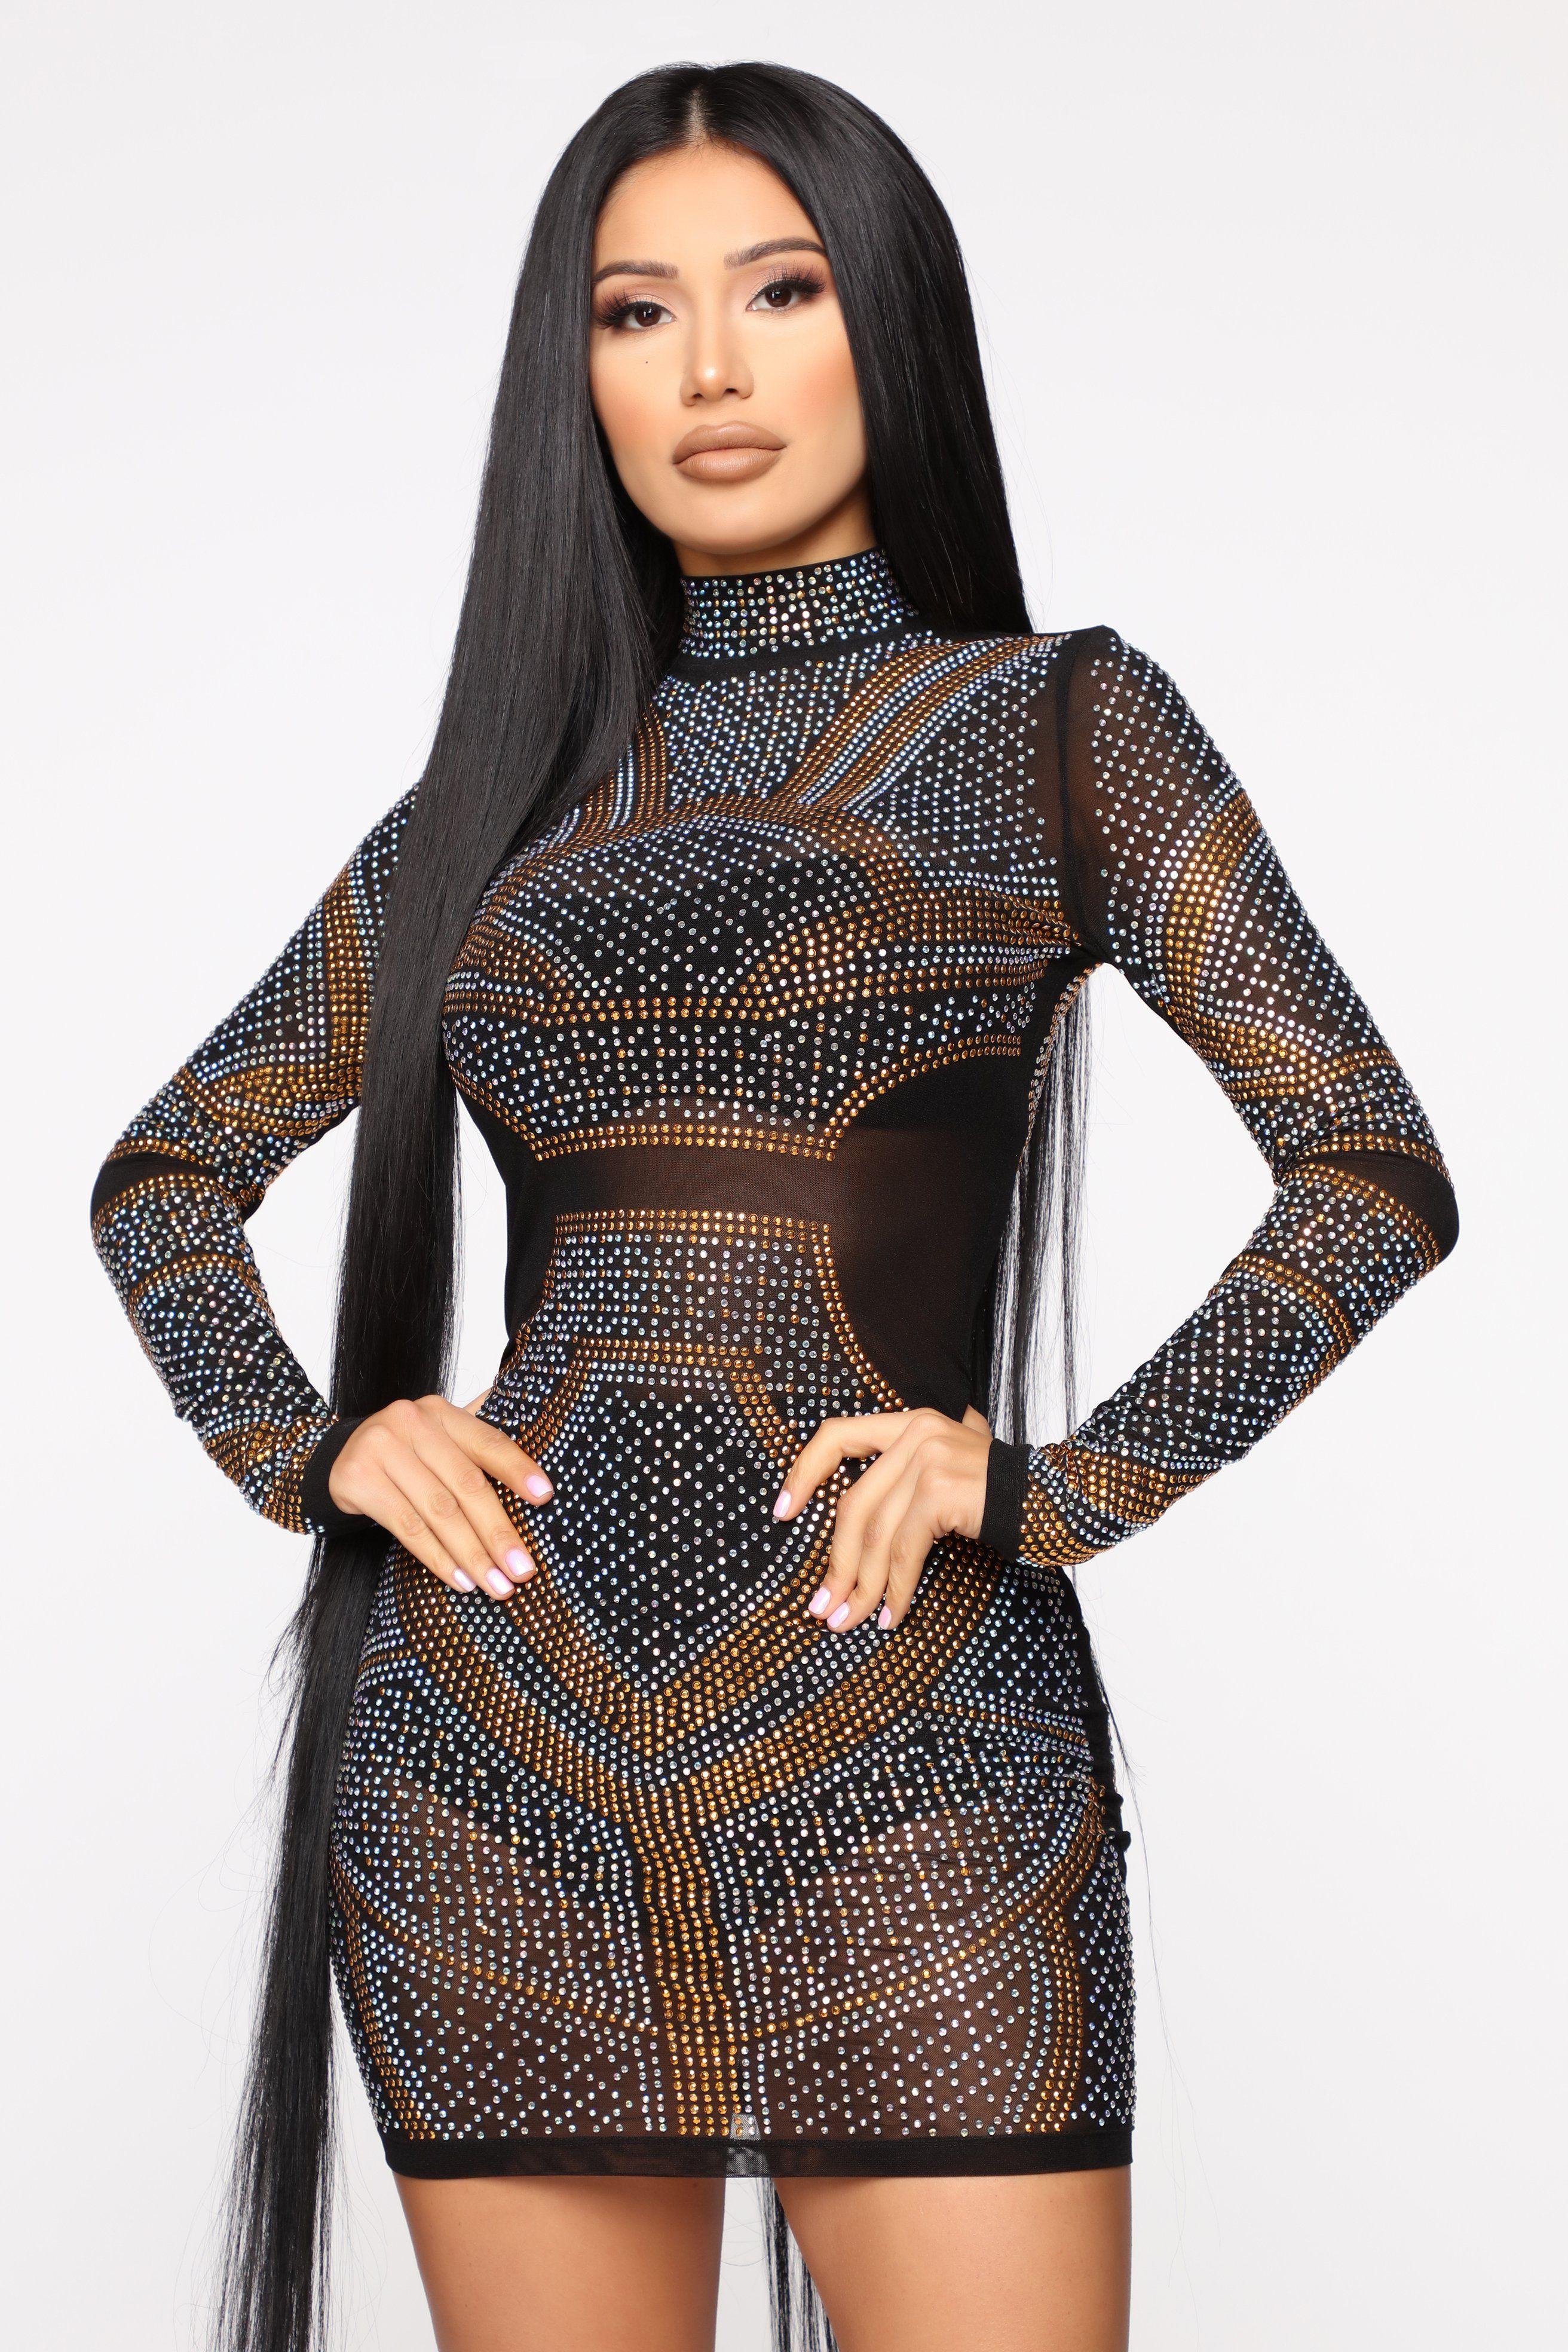 Pin On Sexy Bodycon Dresses [ 3936 x 2624 Pixel ]